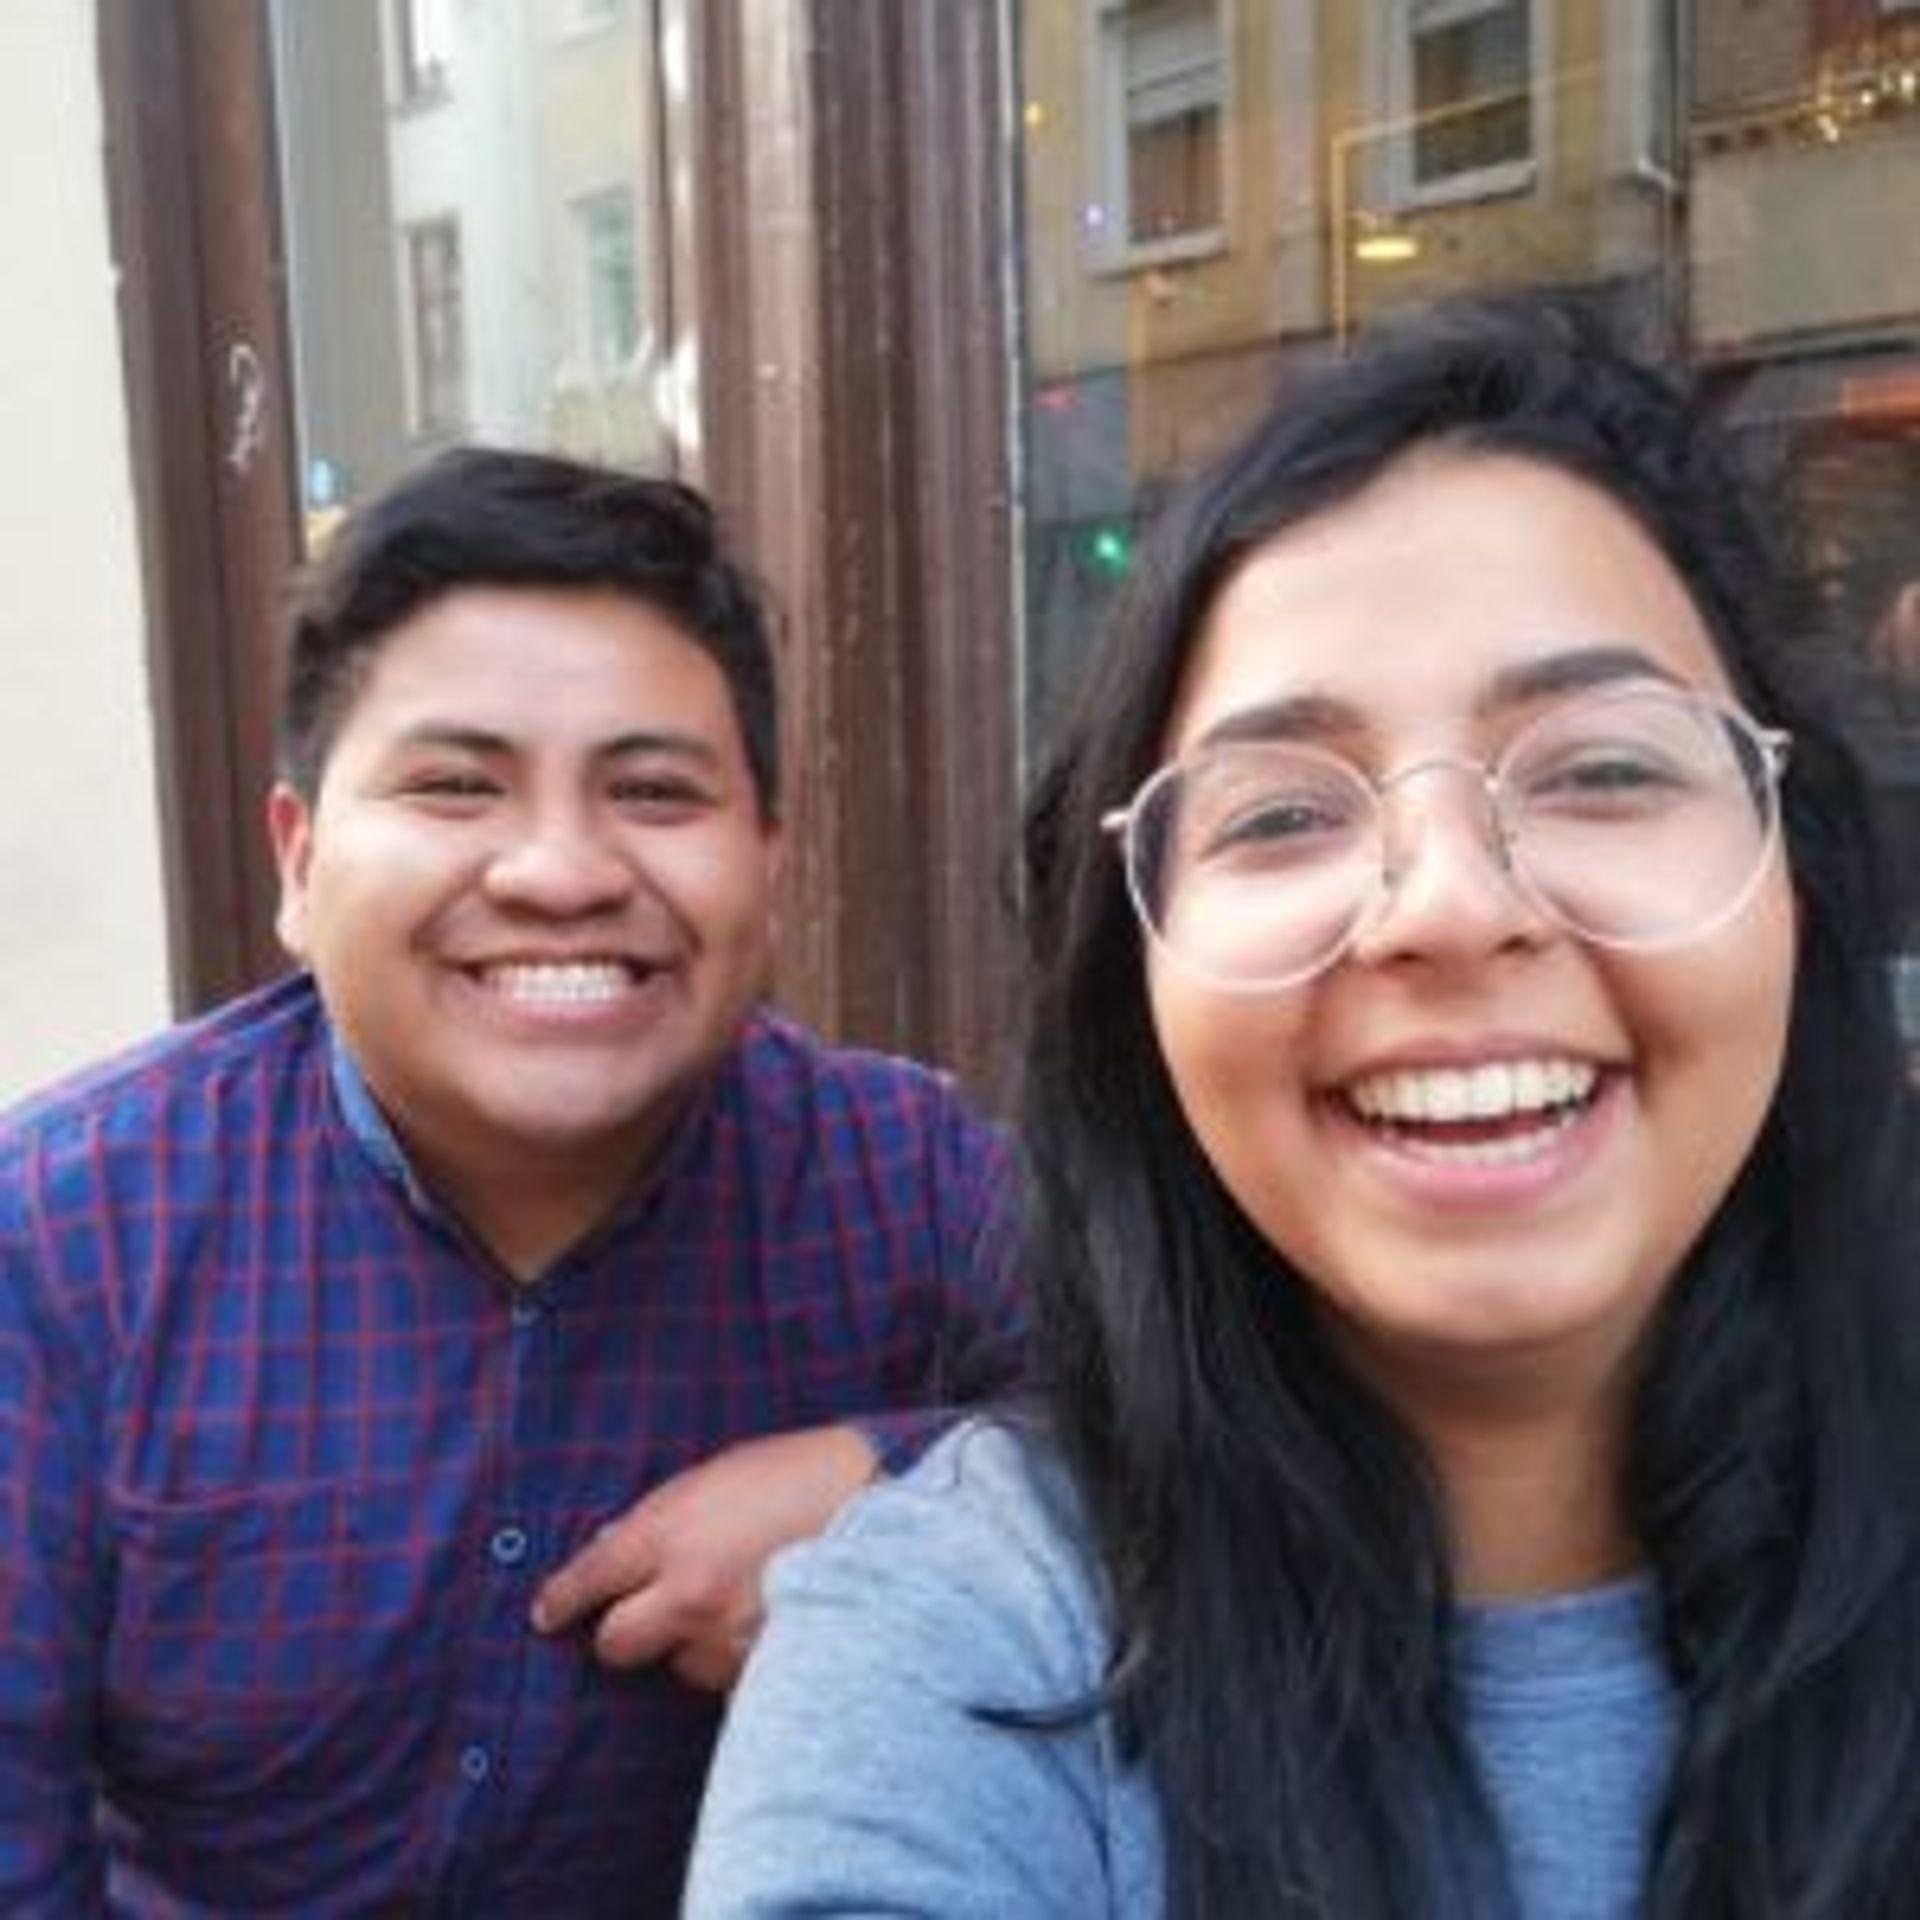 Camilo taking a selfie with a friend, Eva.